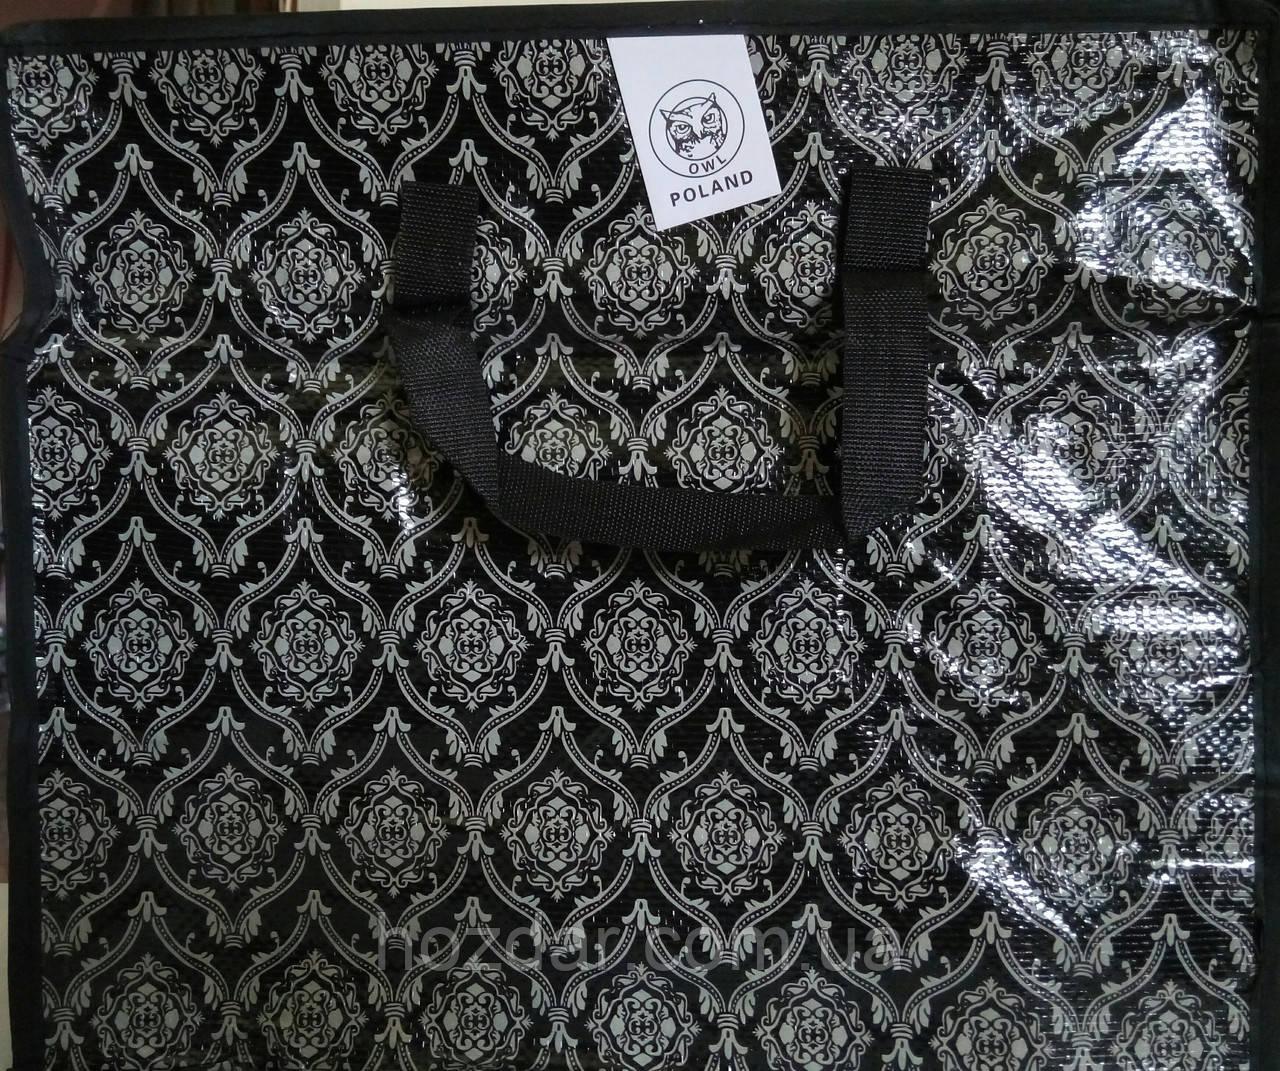 Господарська сумка поліпропіленова горизонтальна №2 (Орнамент)